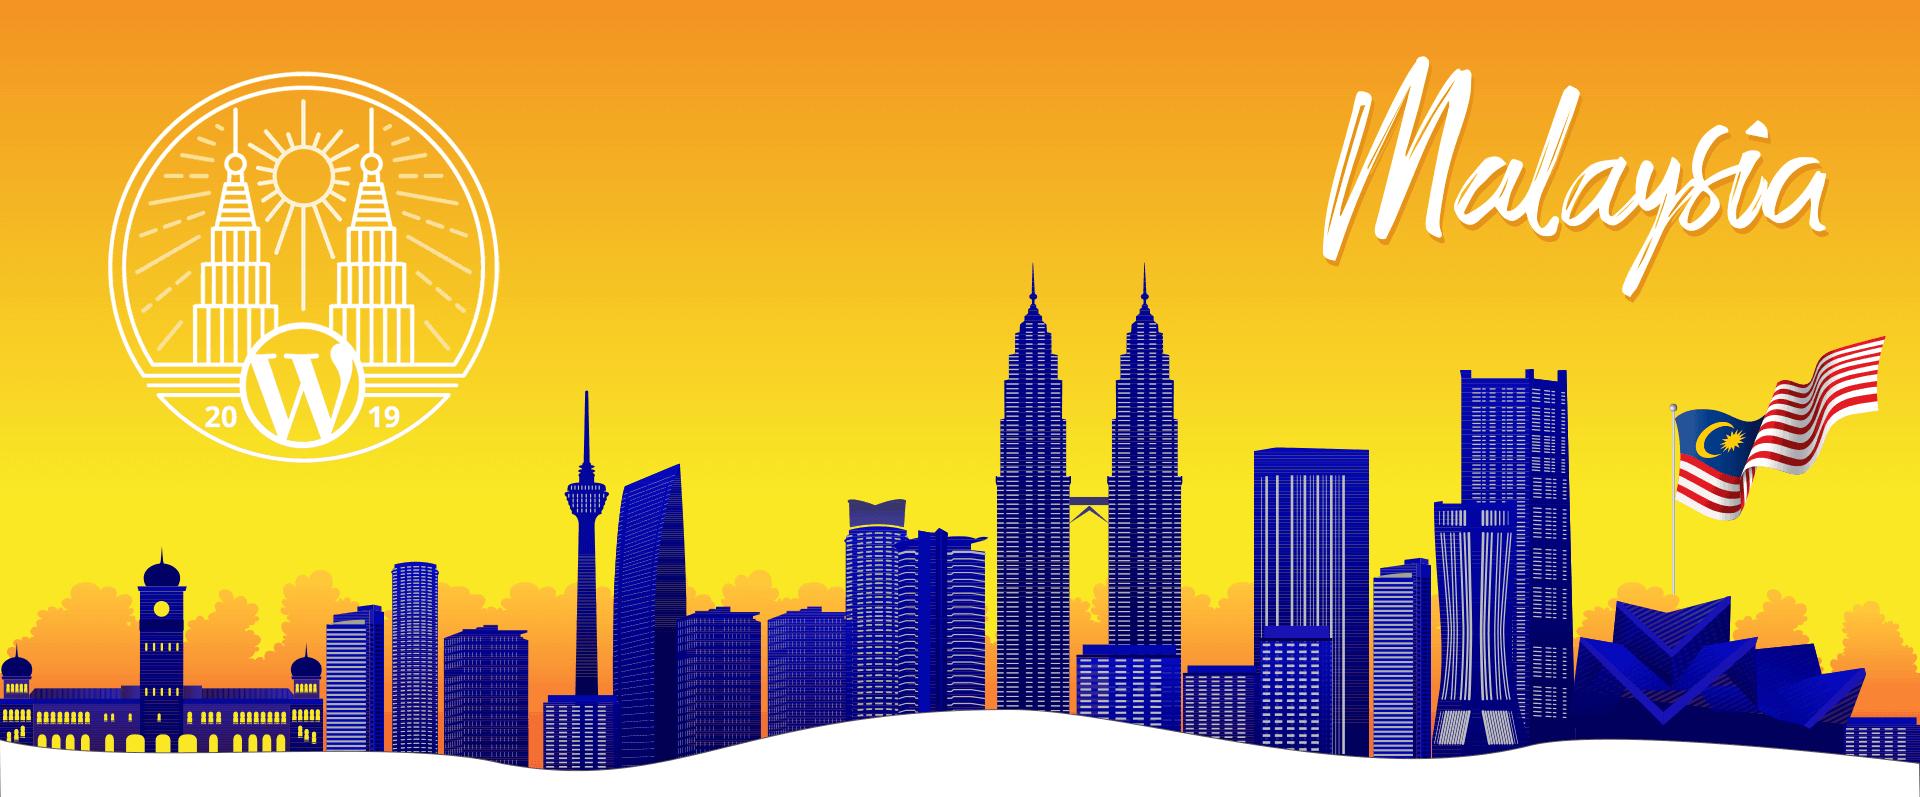 Wordpress 2019 - Kuala Lumpur